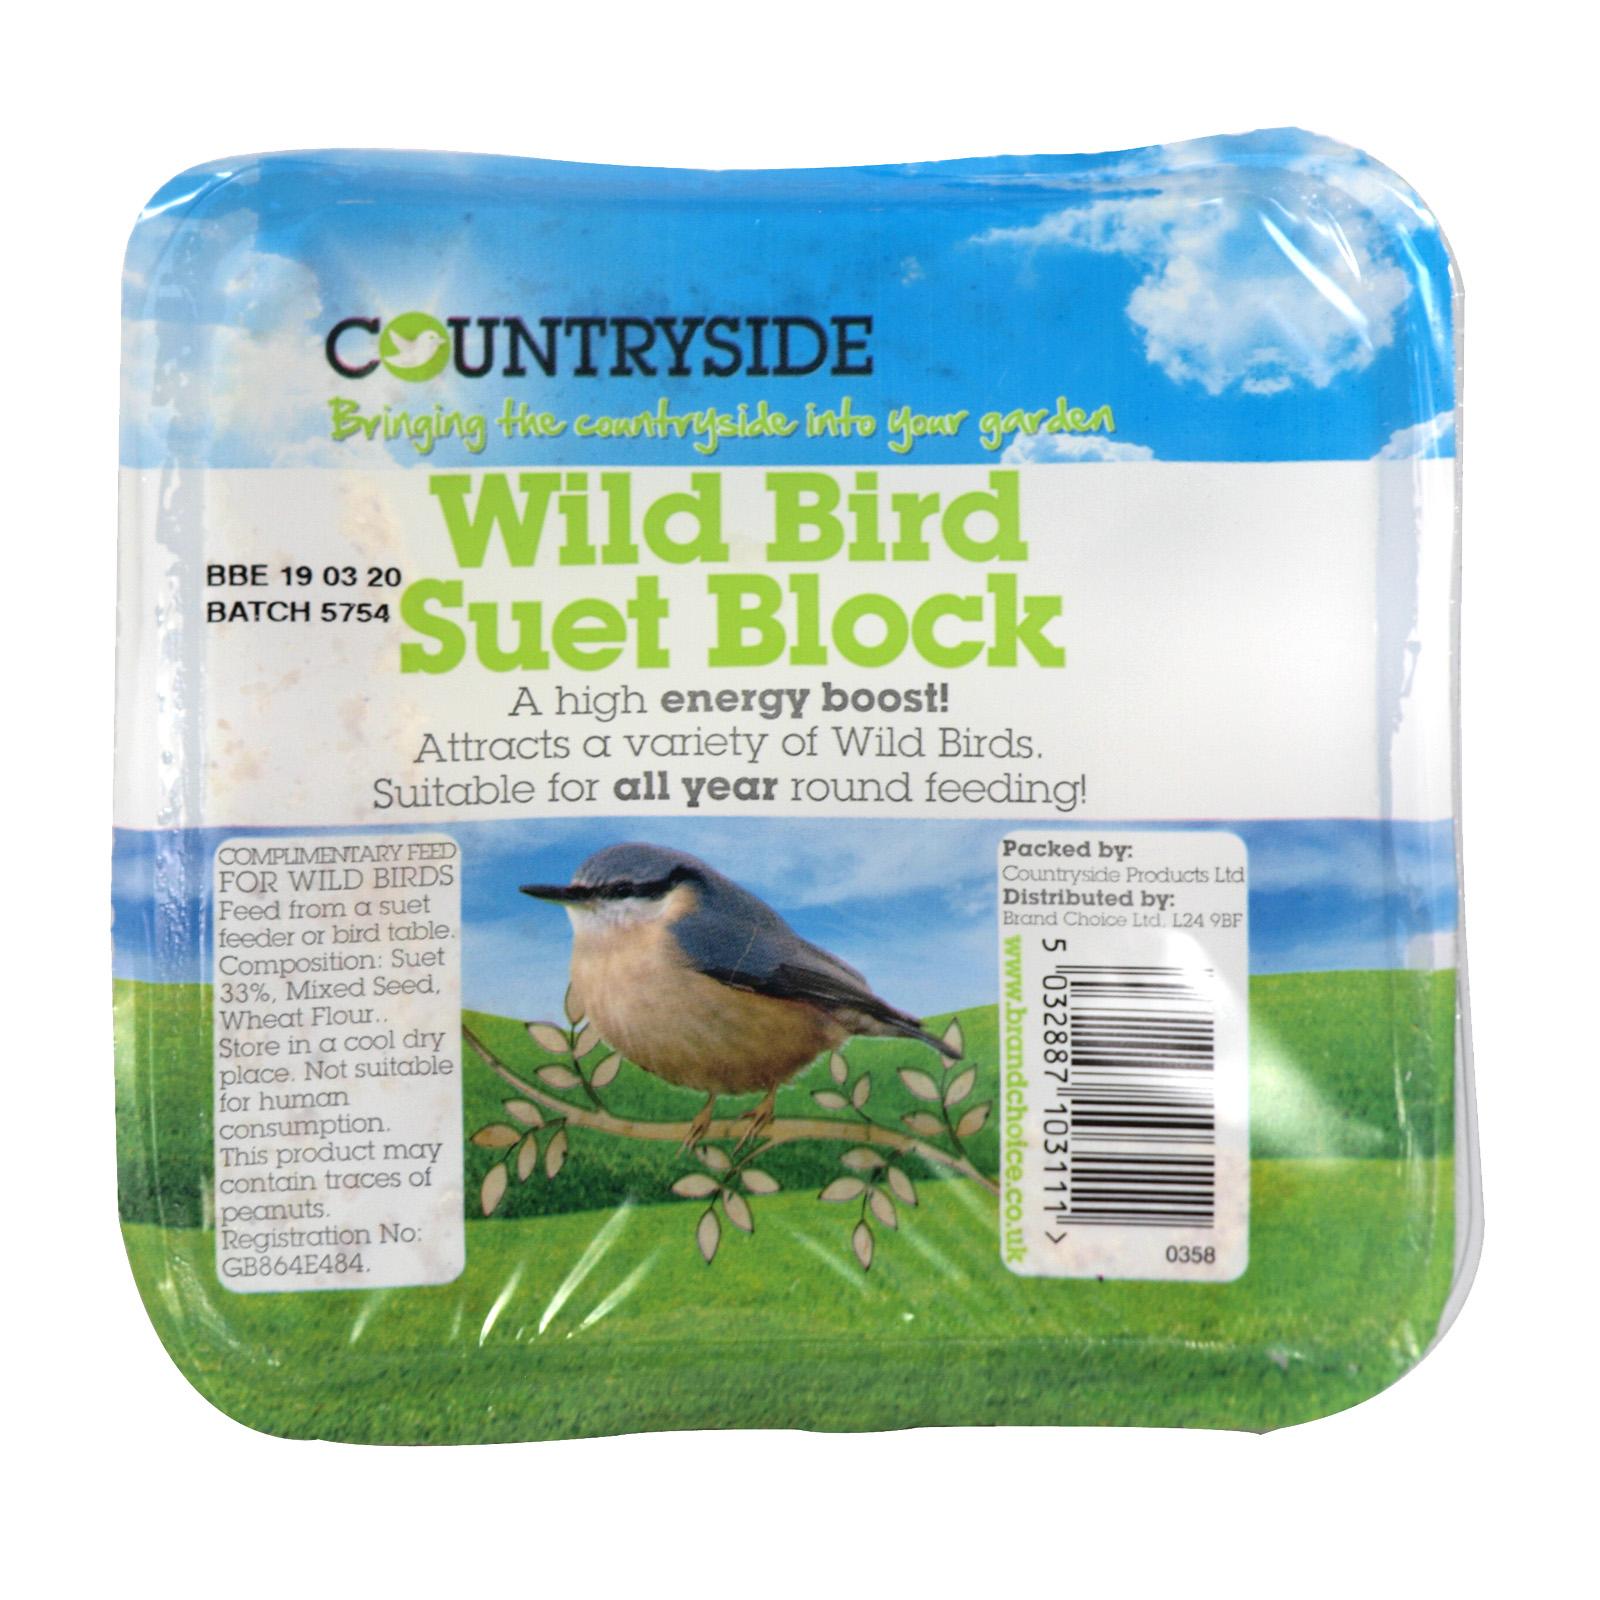 COUNTRYSIDE SUET BLOCK WILD BIRD